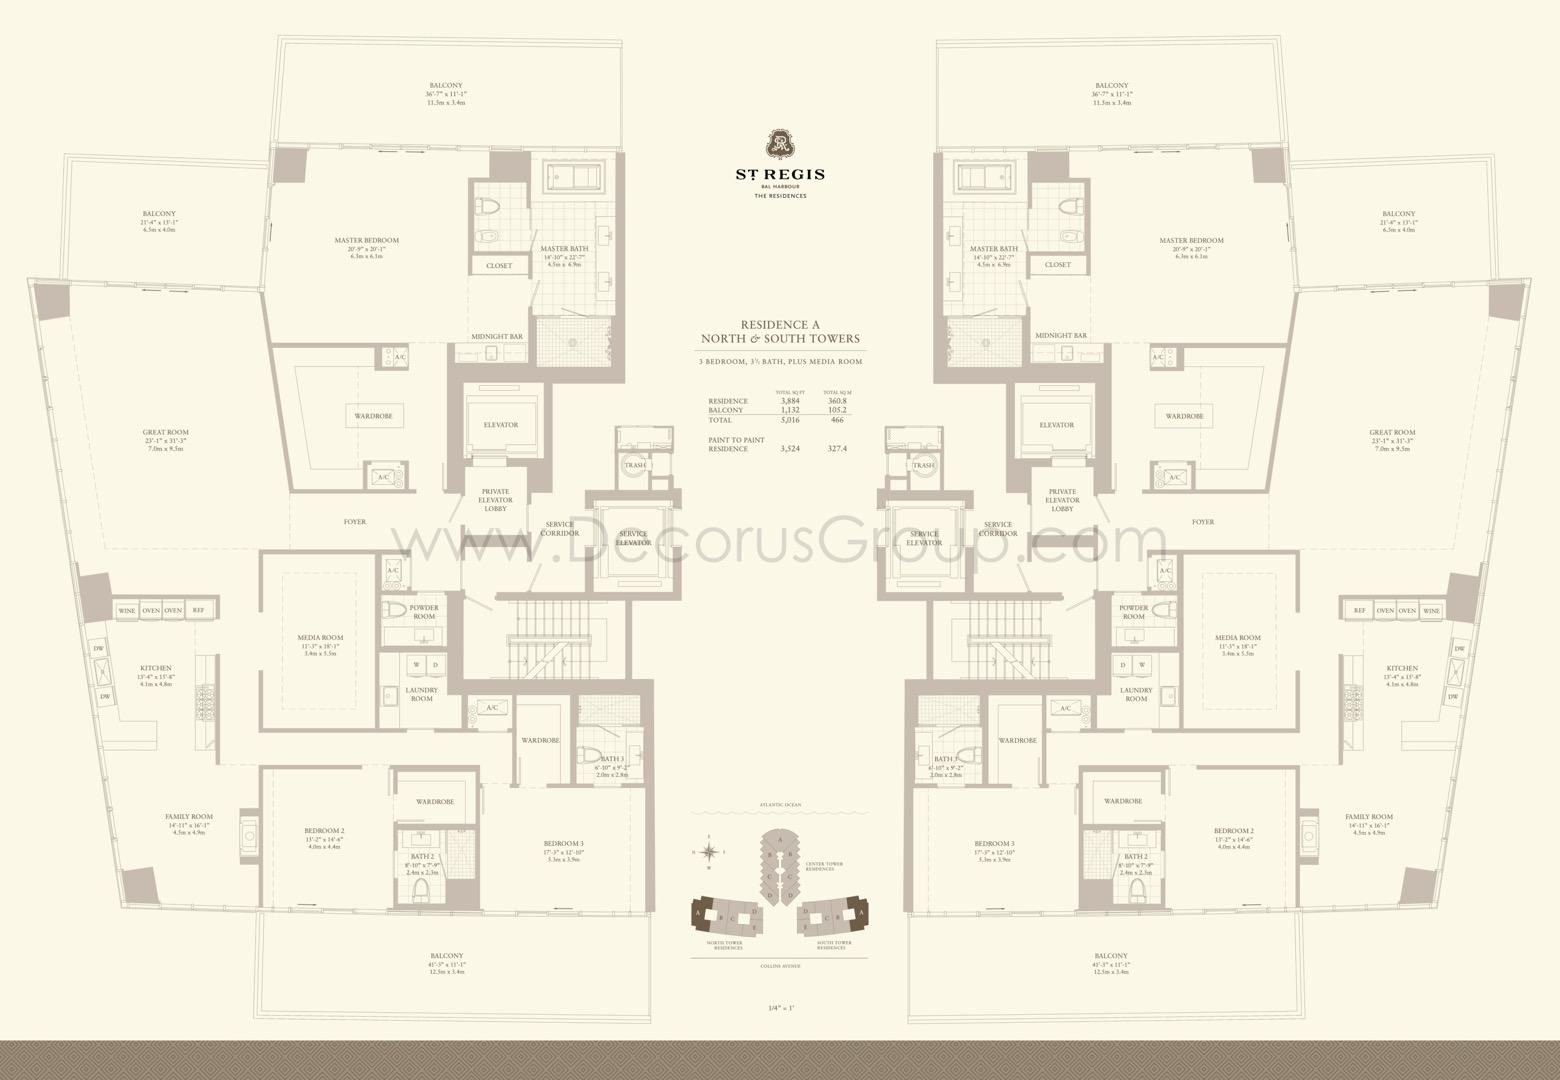 Floor plan image A - 3/3.5 + Media Room  - 5016 sqft image